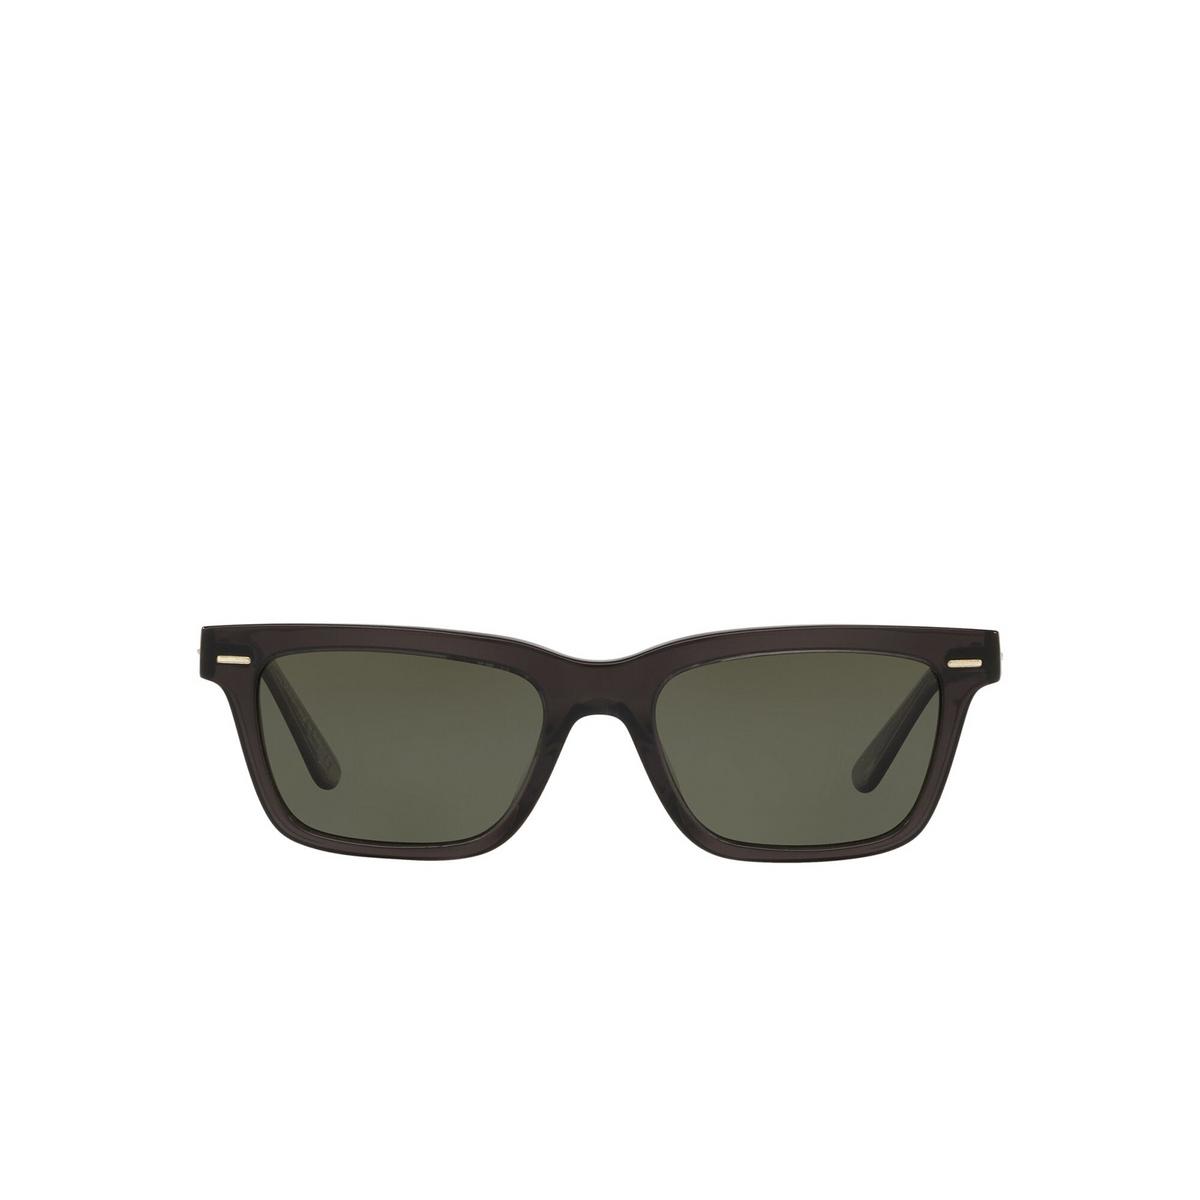 Oliver Peoples® Square Sunglasses: Ba Cc OV5388SU color Vivid Dark Grey 1665P1 - front view.